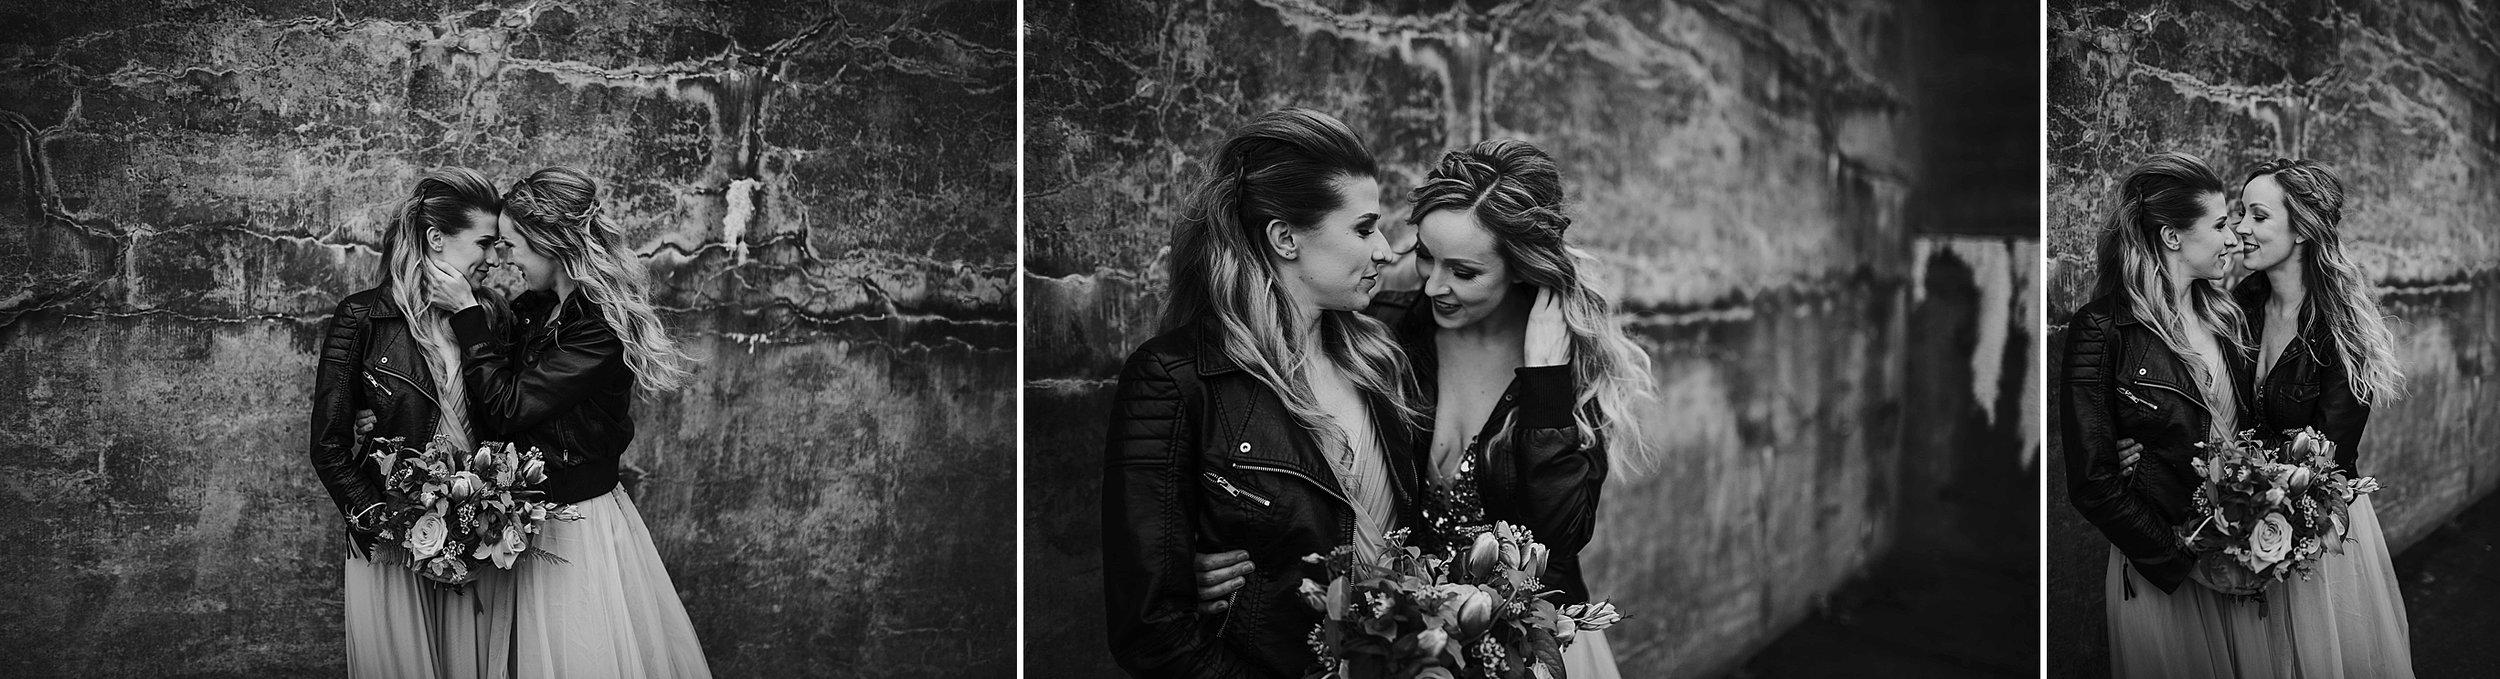 Wedding-photographer-J HODGES PHOTOGRAPHY_0239.jpg